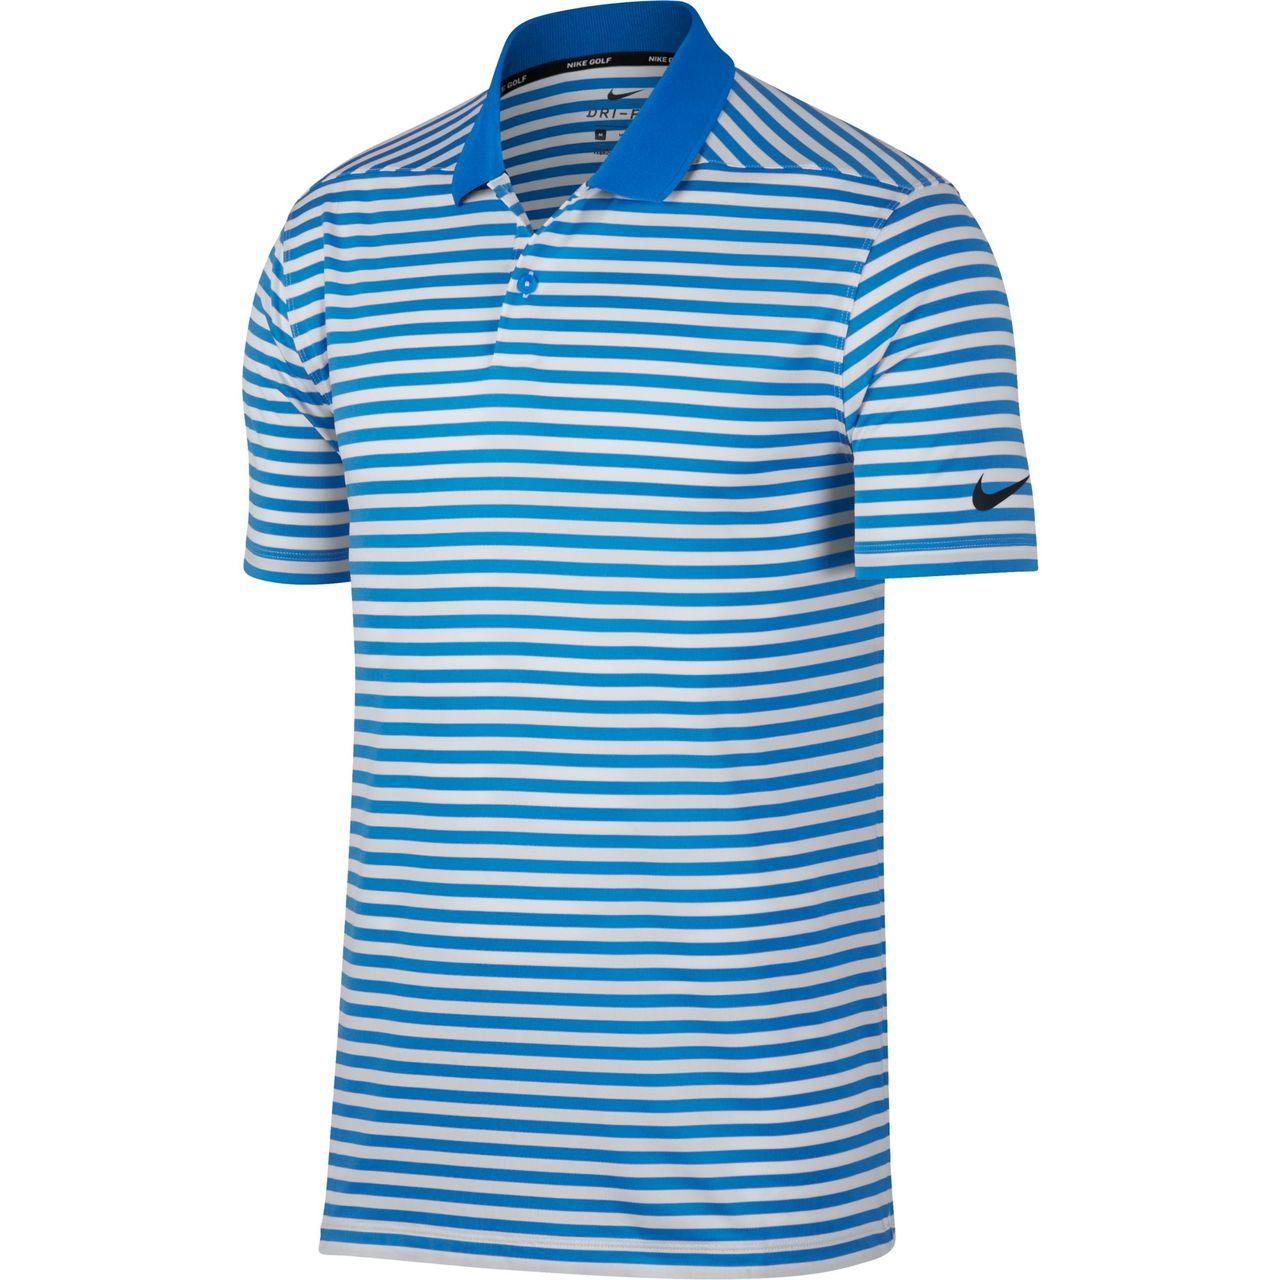 09af4c10 Shop Nike Dry Victory Stripe Men's Golf Polo | GLW